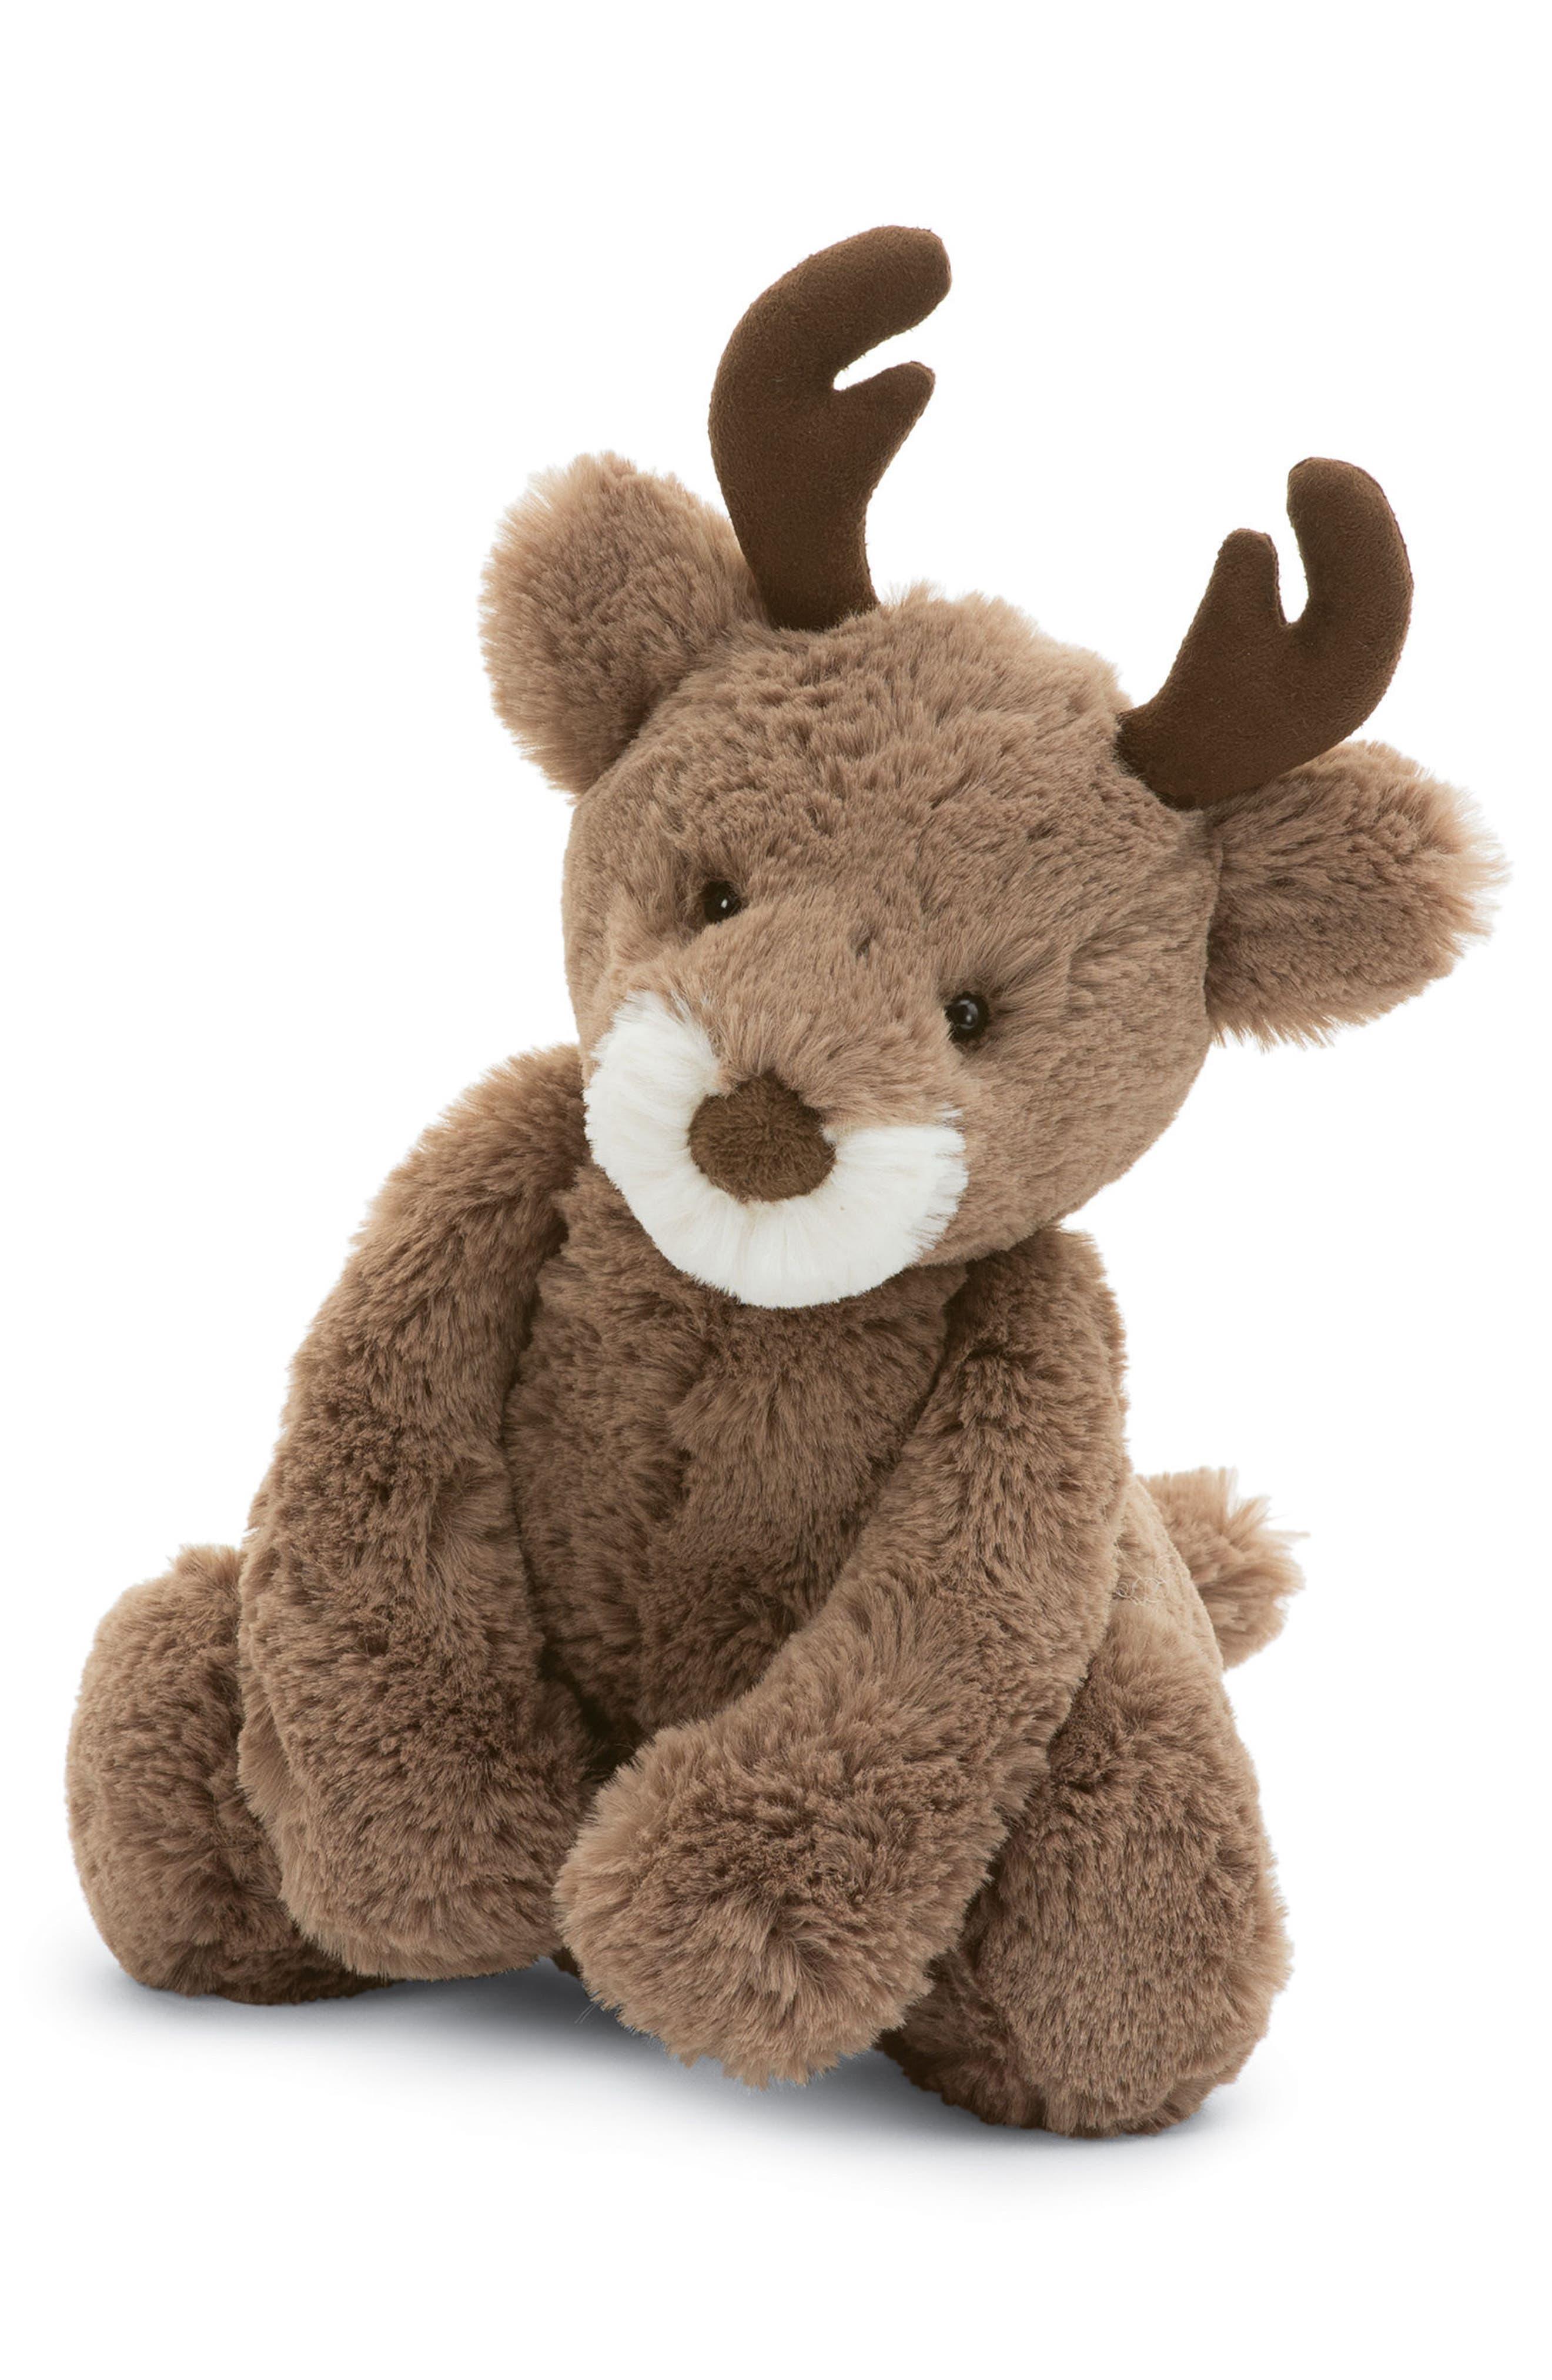 Main Image - Jellycat Medium Bashful Reindeer Stuffed Animal